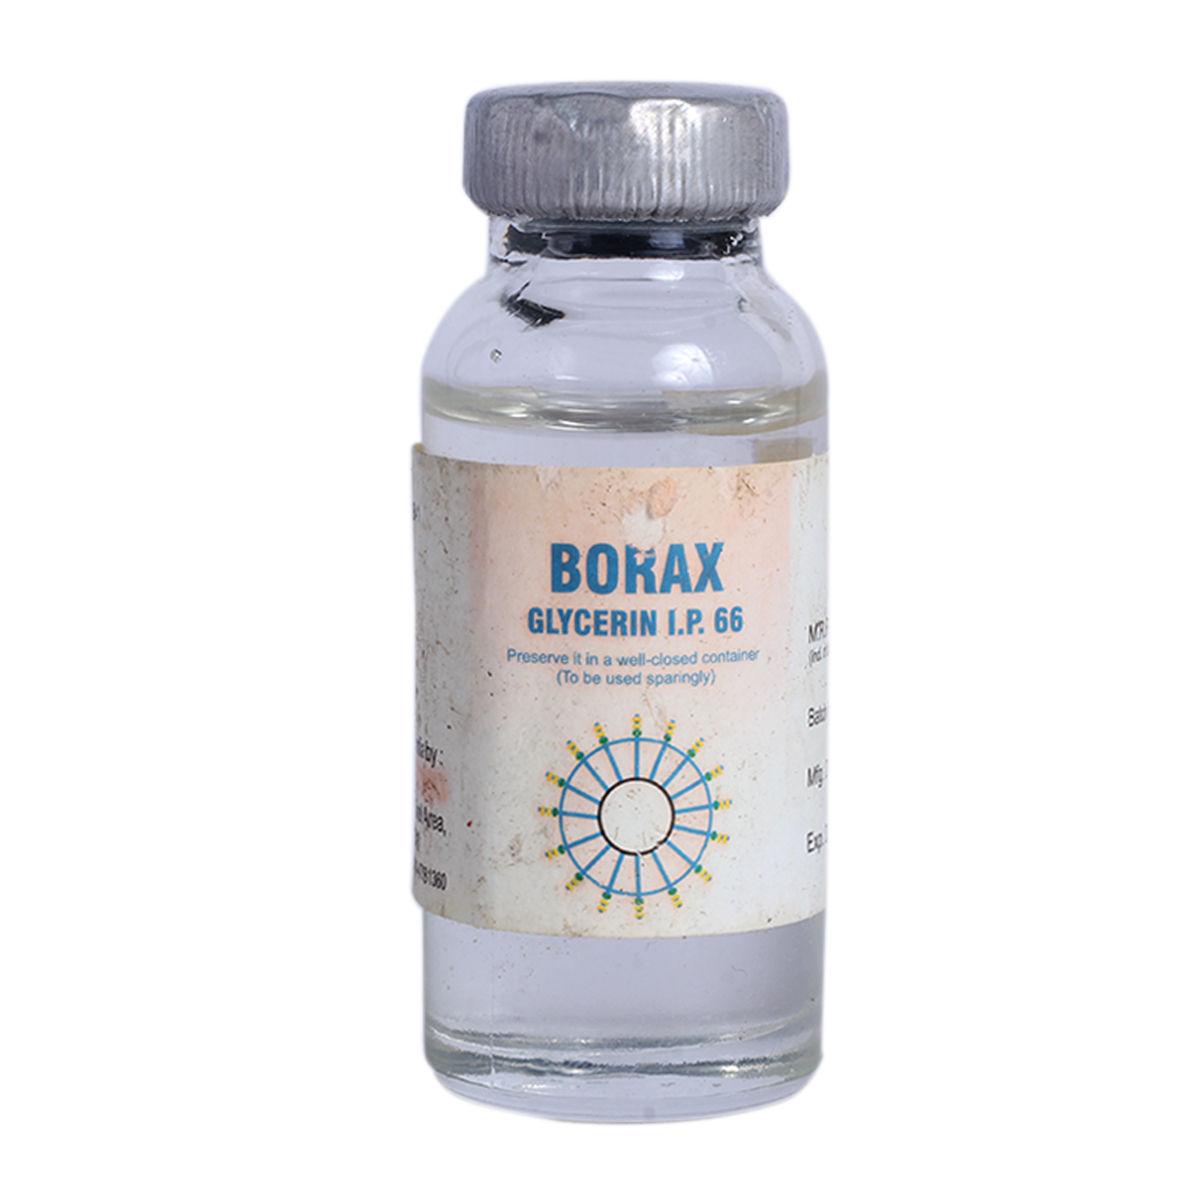 Borax Glycerin 50gm, Pack of 1